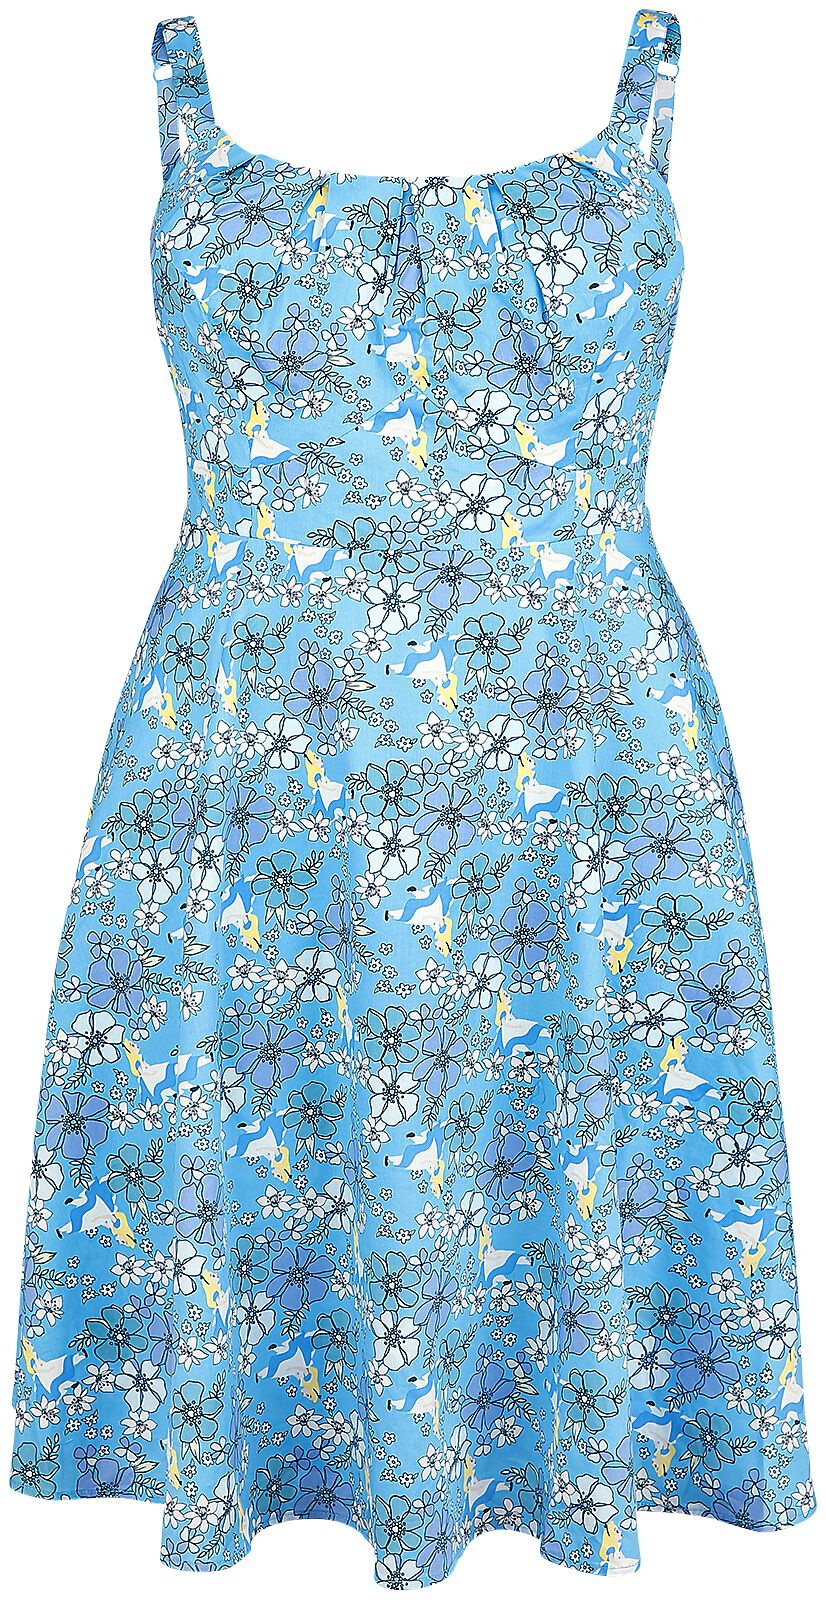 Image of   Alice i Eventyrland Retro Floral Kjole multifarvet